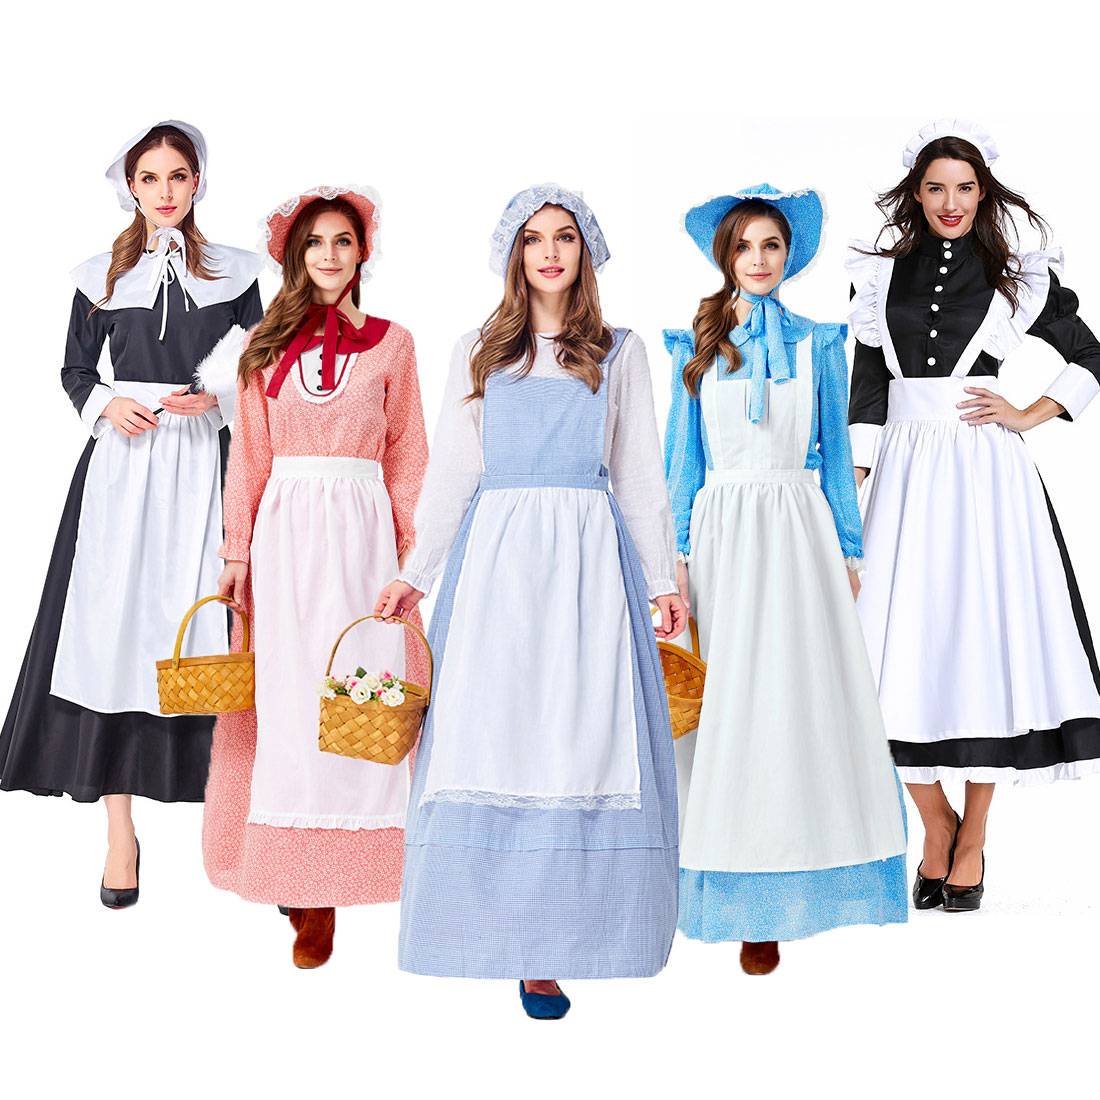 Umorden Adult Colonial Pioneer Girl Costume Women Village Farm Prairie Maiden Maid Costumes Halloween Party Fancy Dress